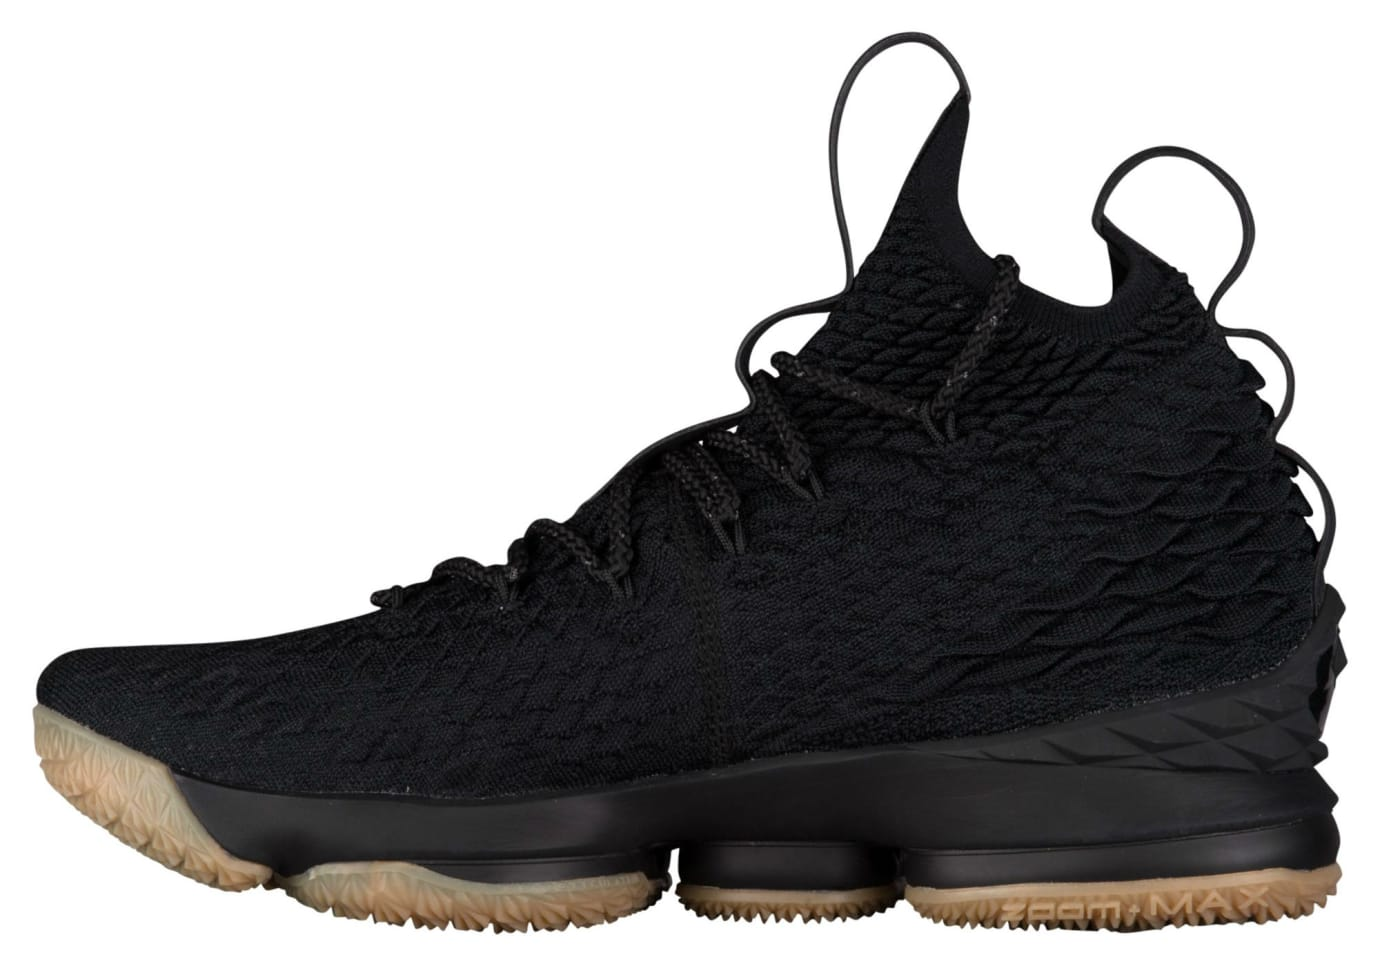 Nike LeBron 15 Black Gum Release Date 897648-300 Medial